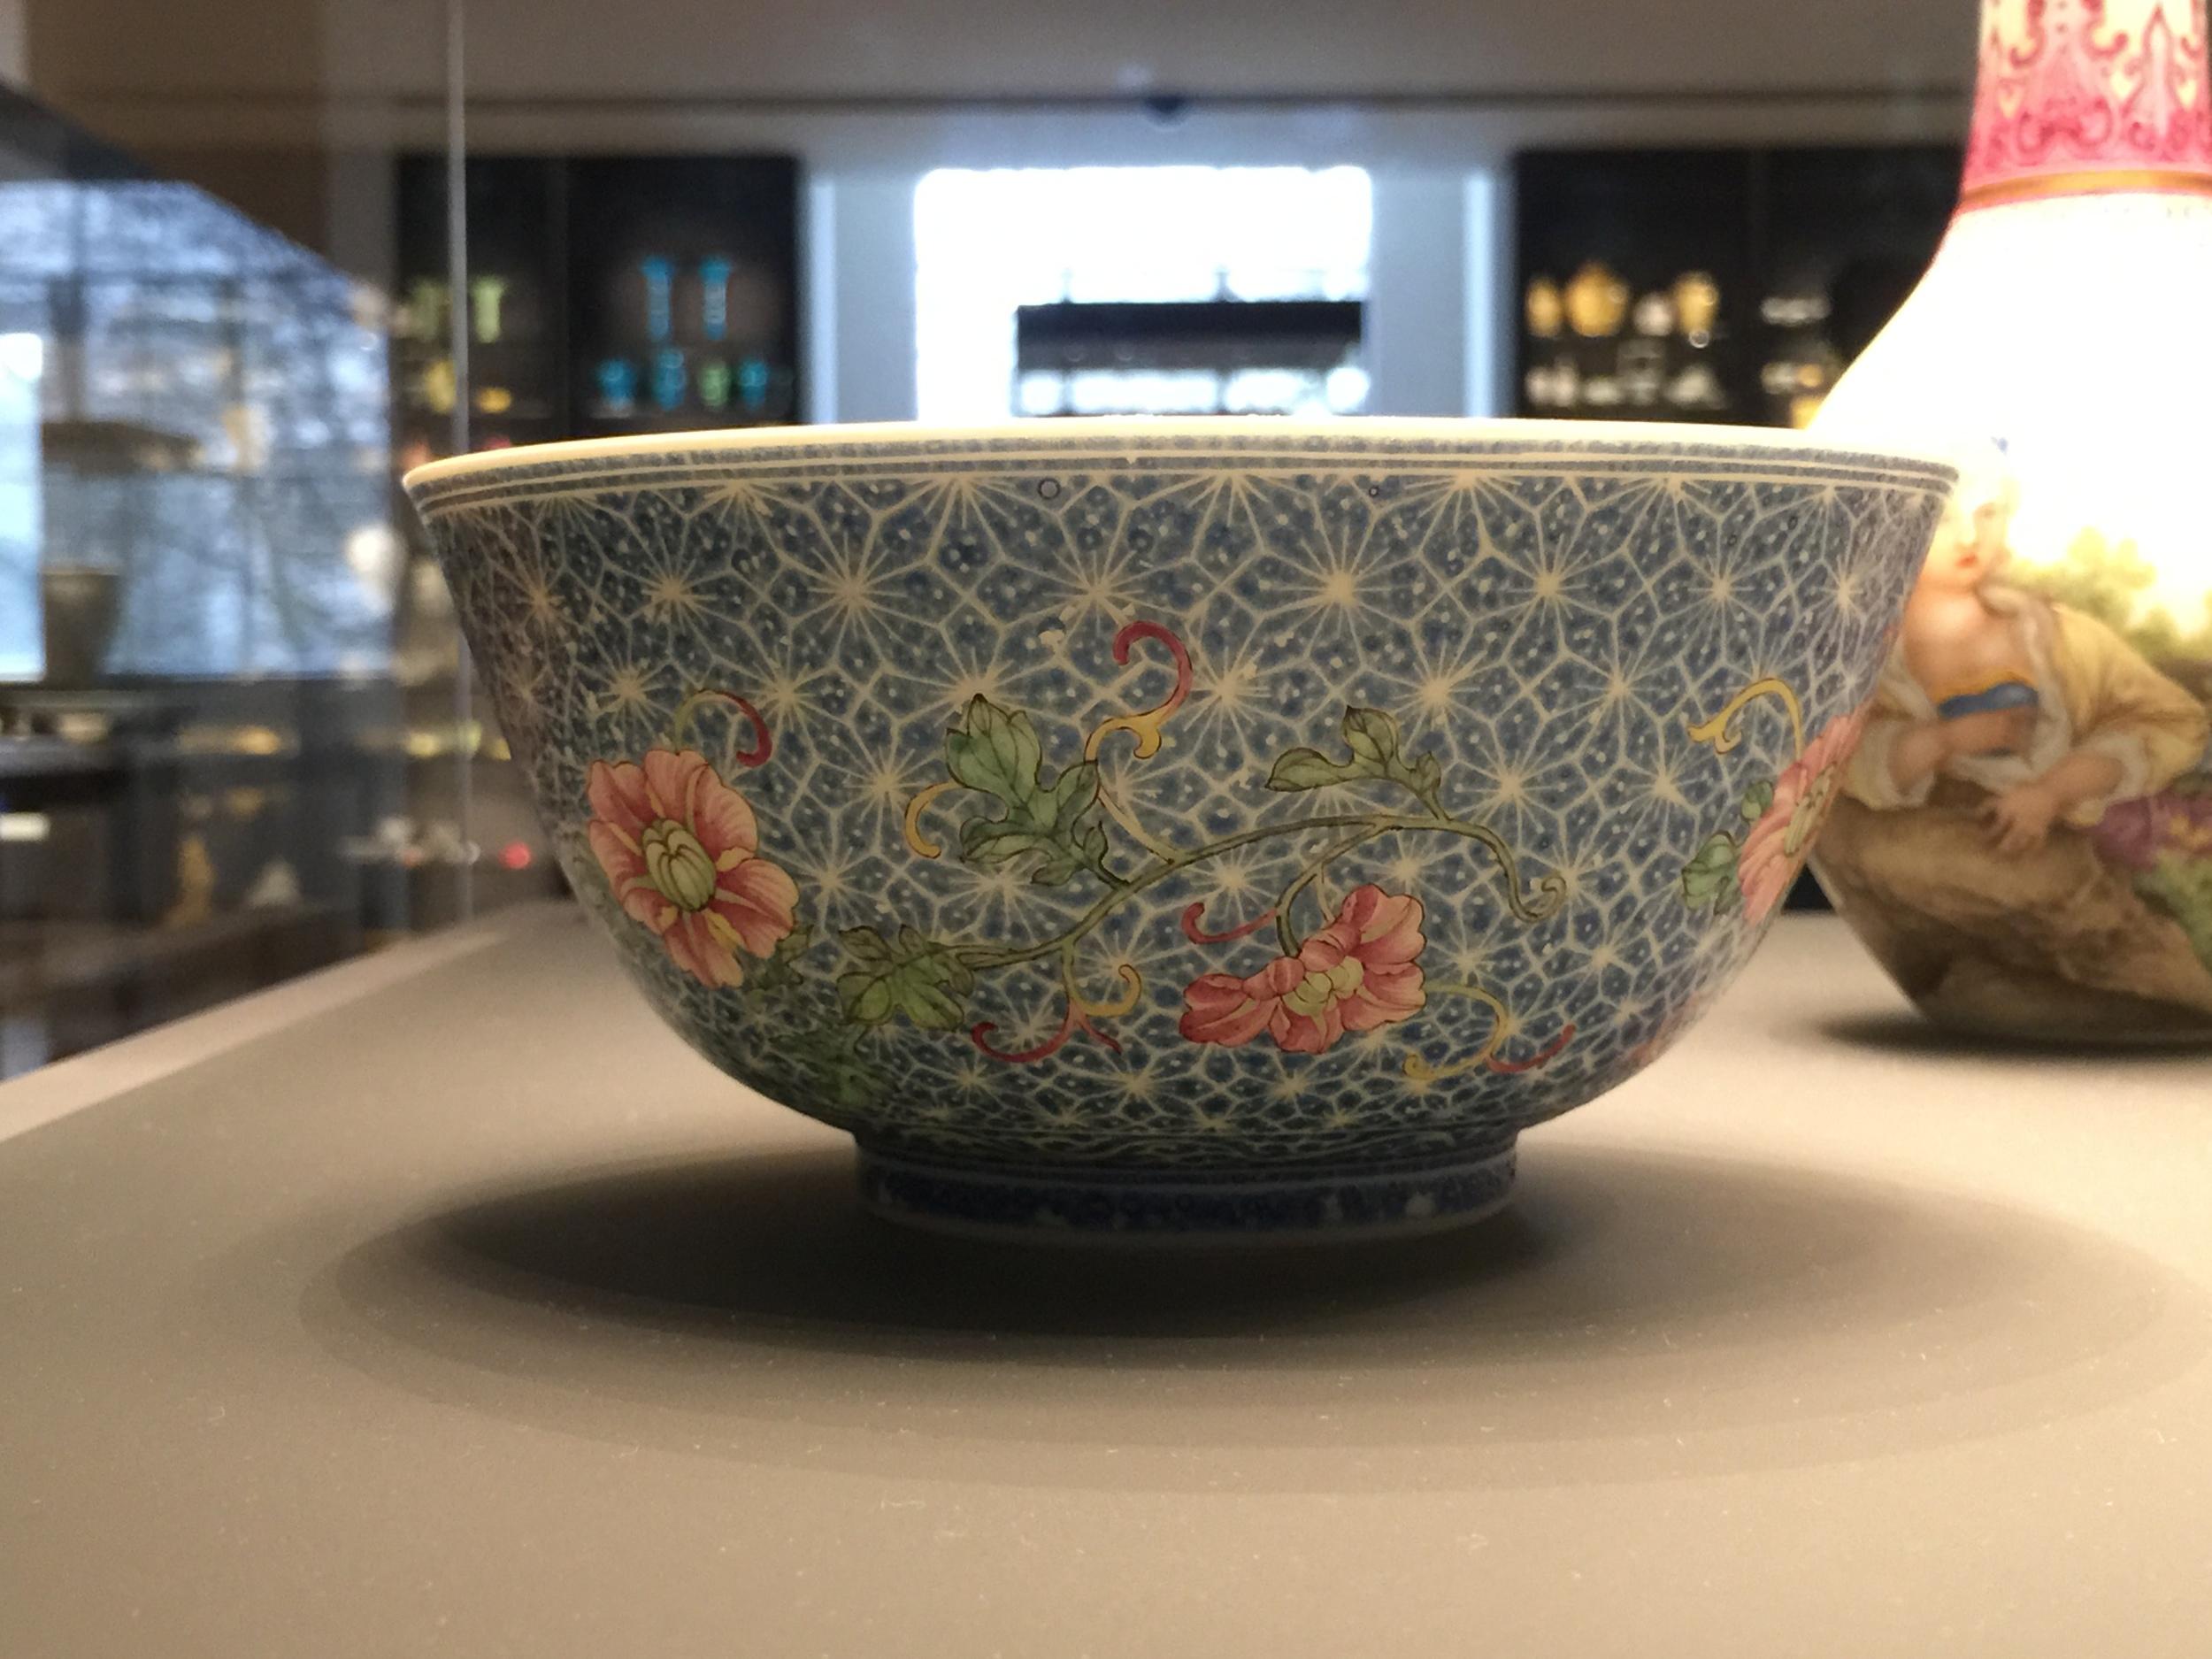 Chinese-Porcelain-British-Museum-Percival-David-jessewaugh.com-140.jpg